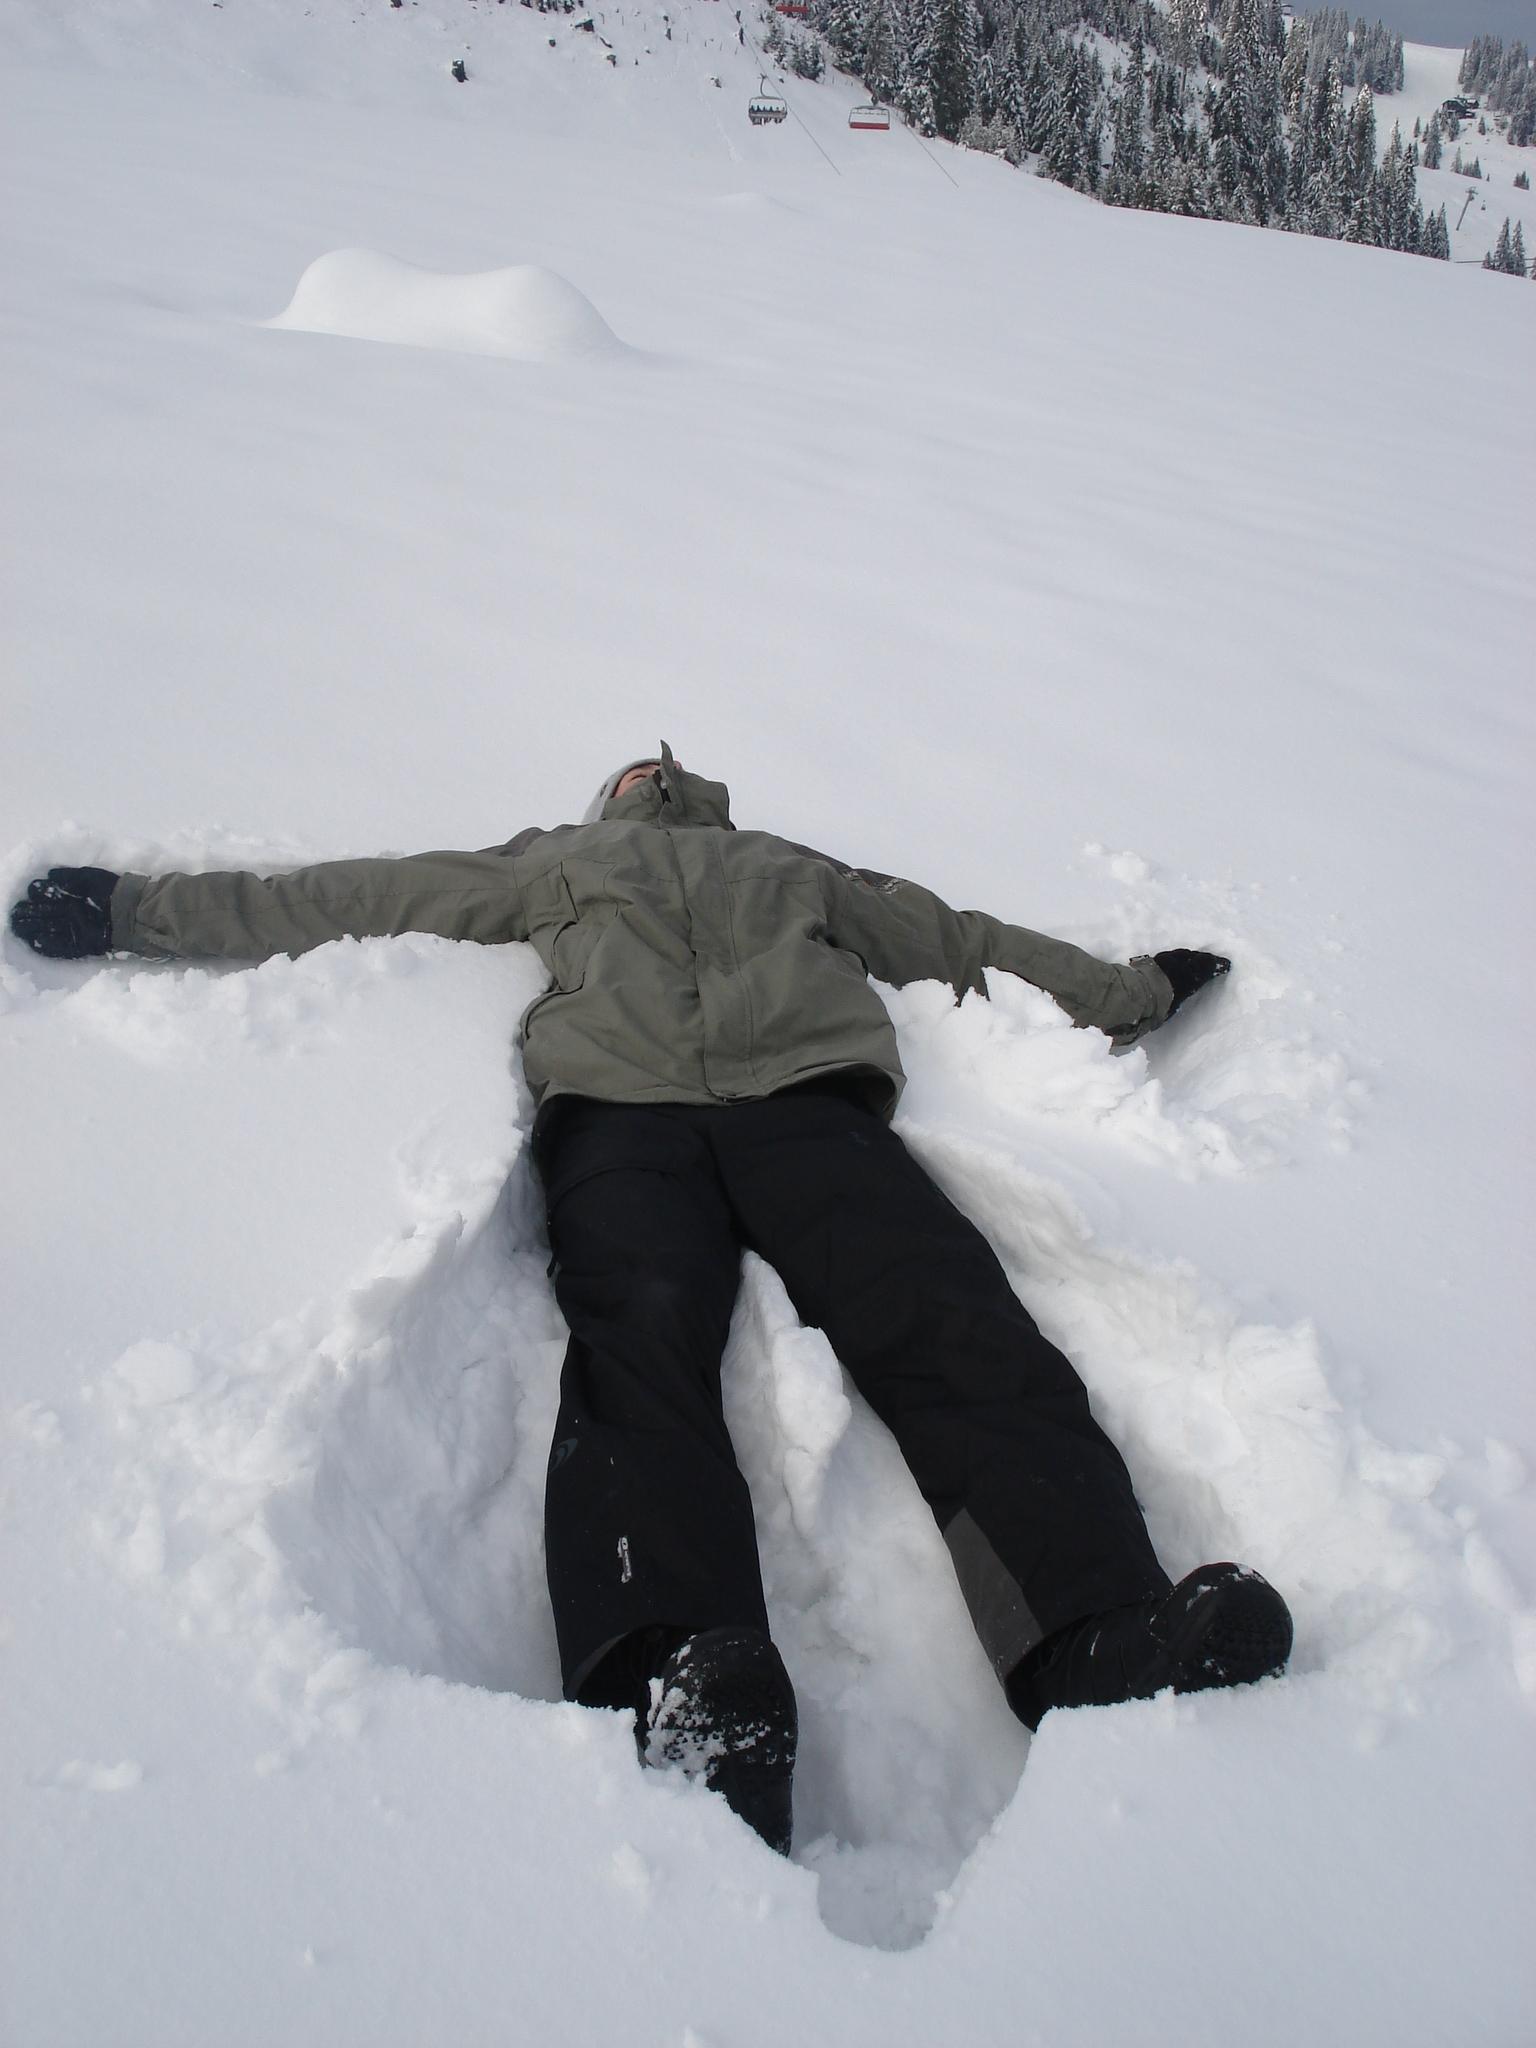 File:Snow Angel Man.JPG